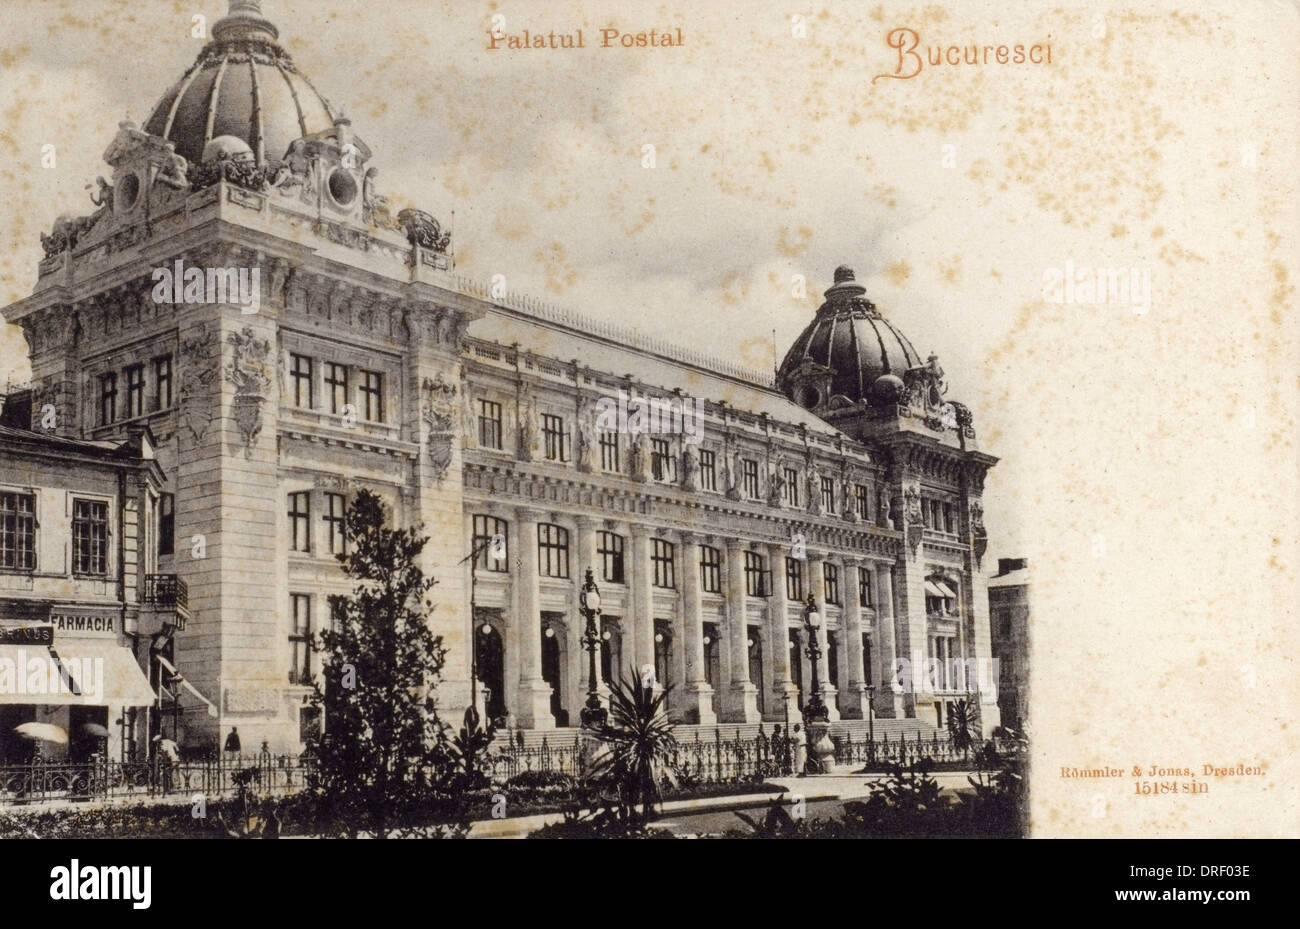 Romania - Bucharest - Postal Palace - Stock Image